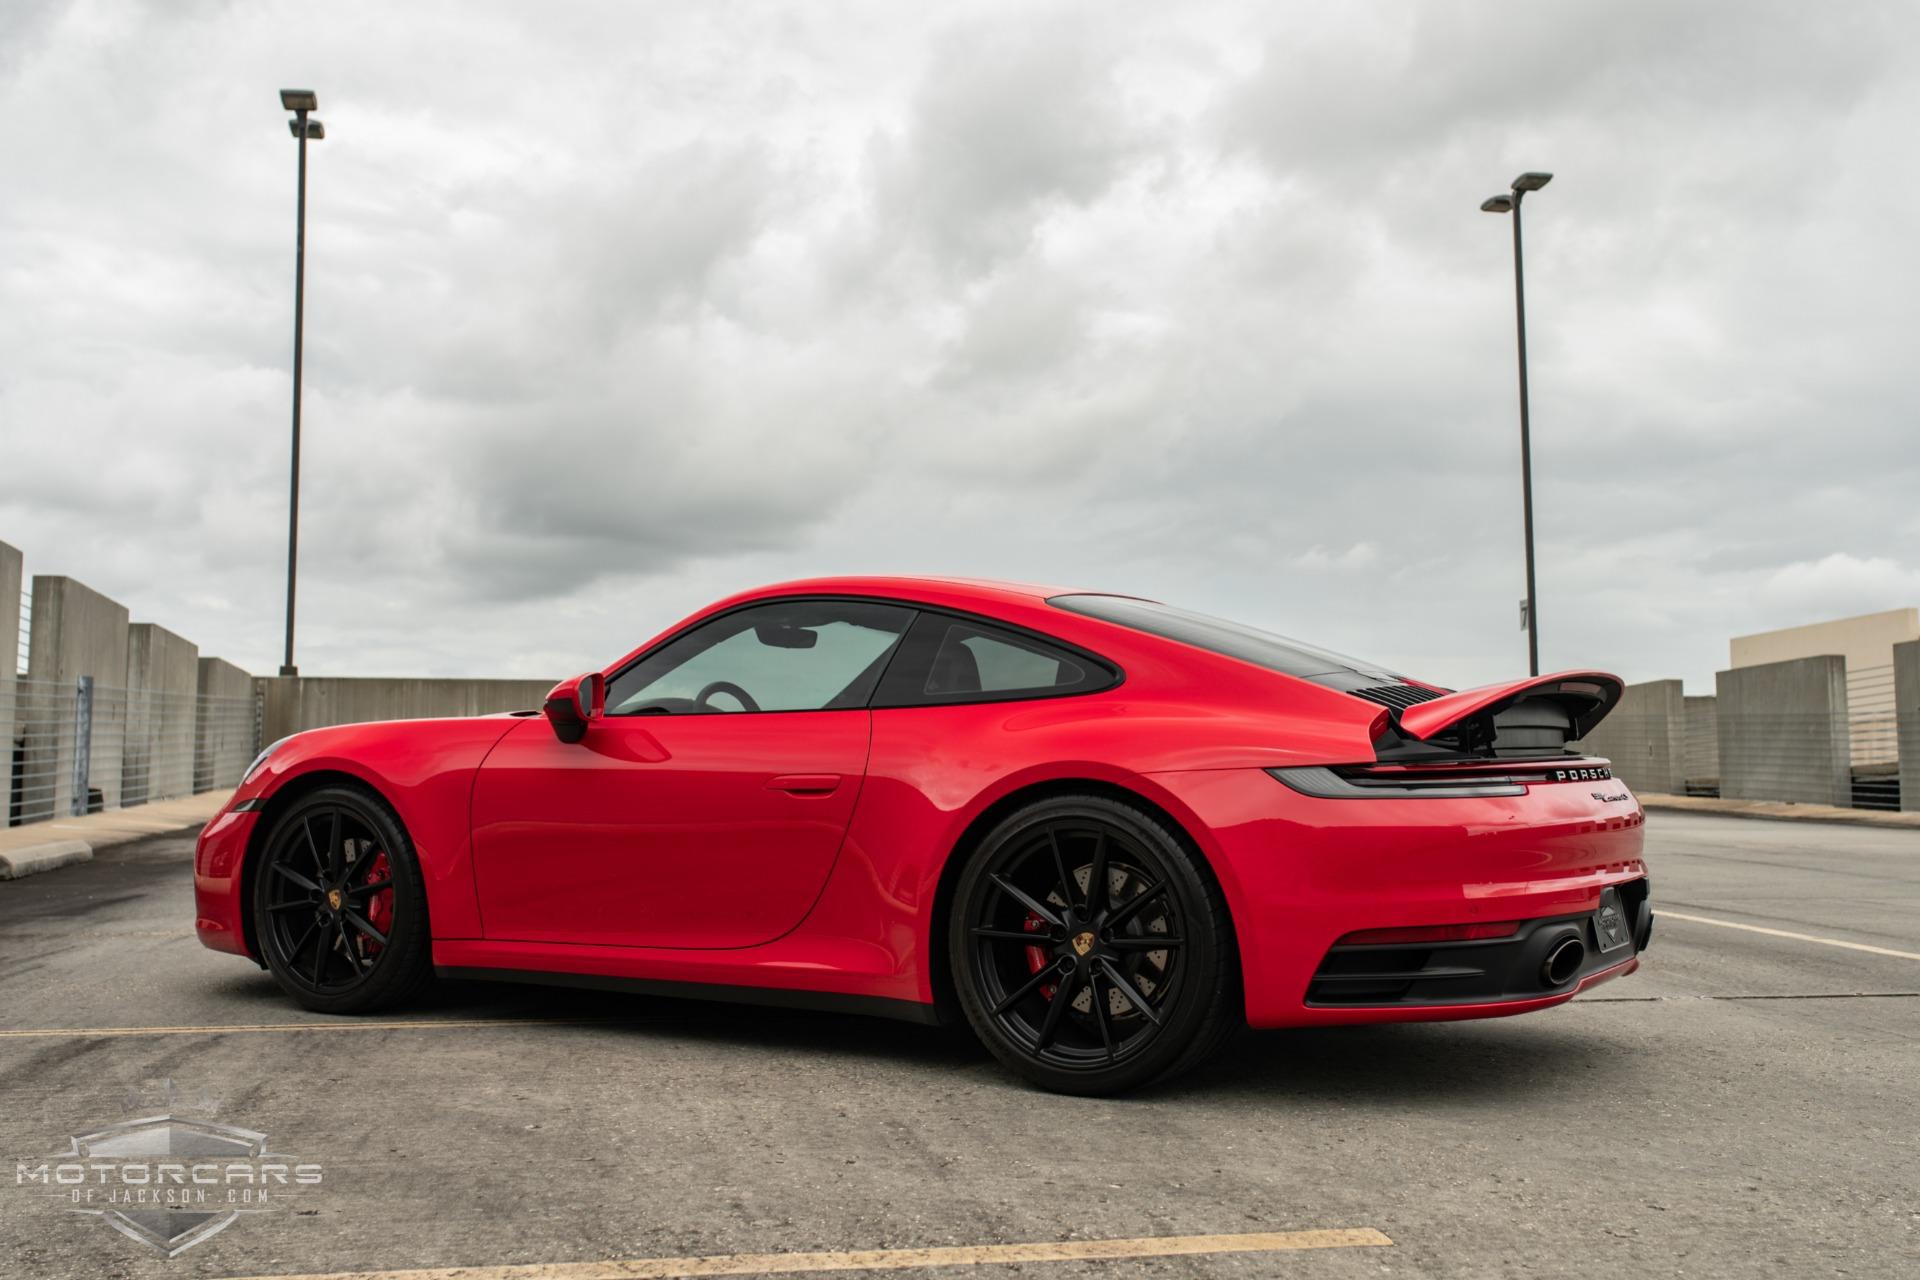 Used-2020-Porsche-911-Carrera-4S-(992)-Jackson-MS